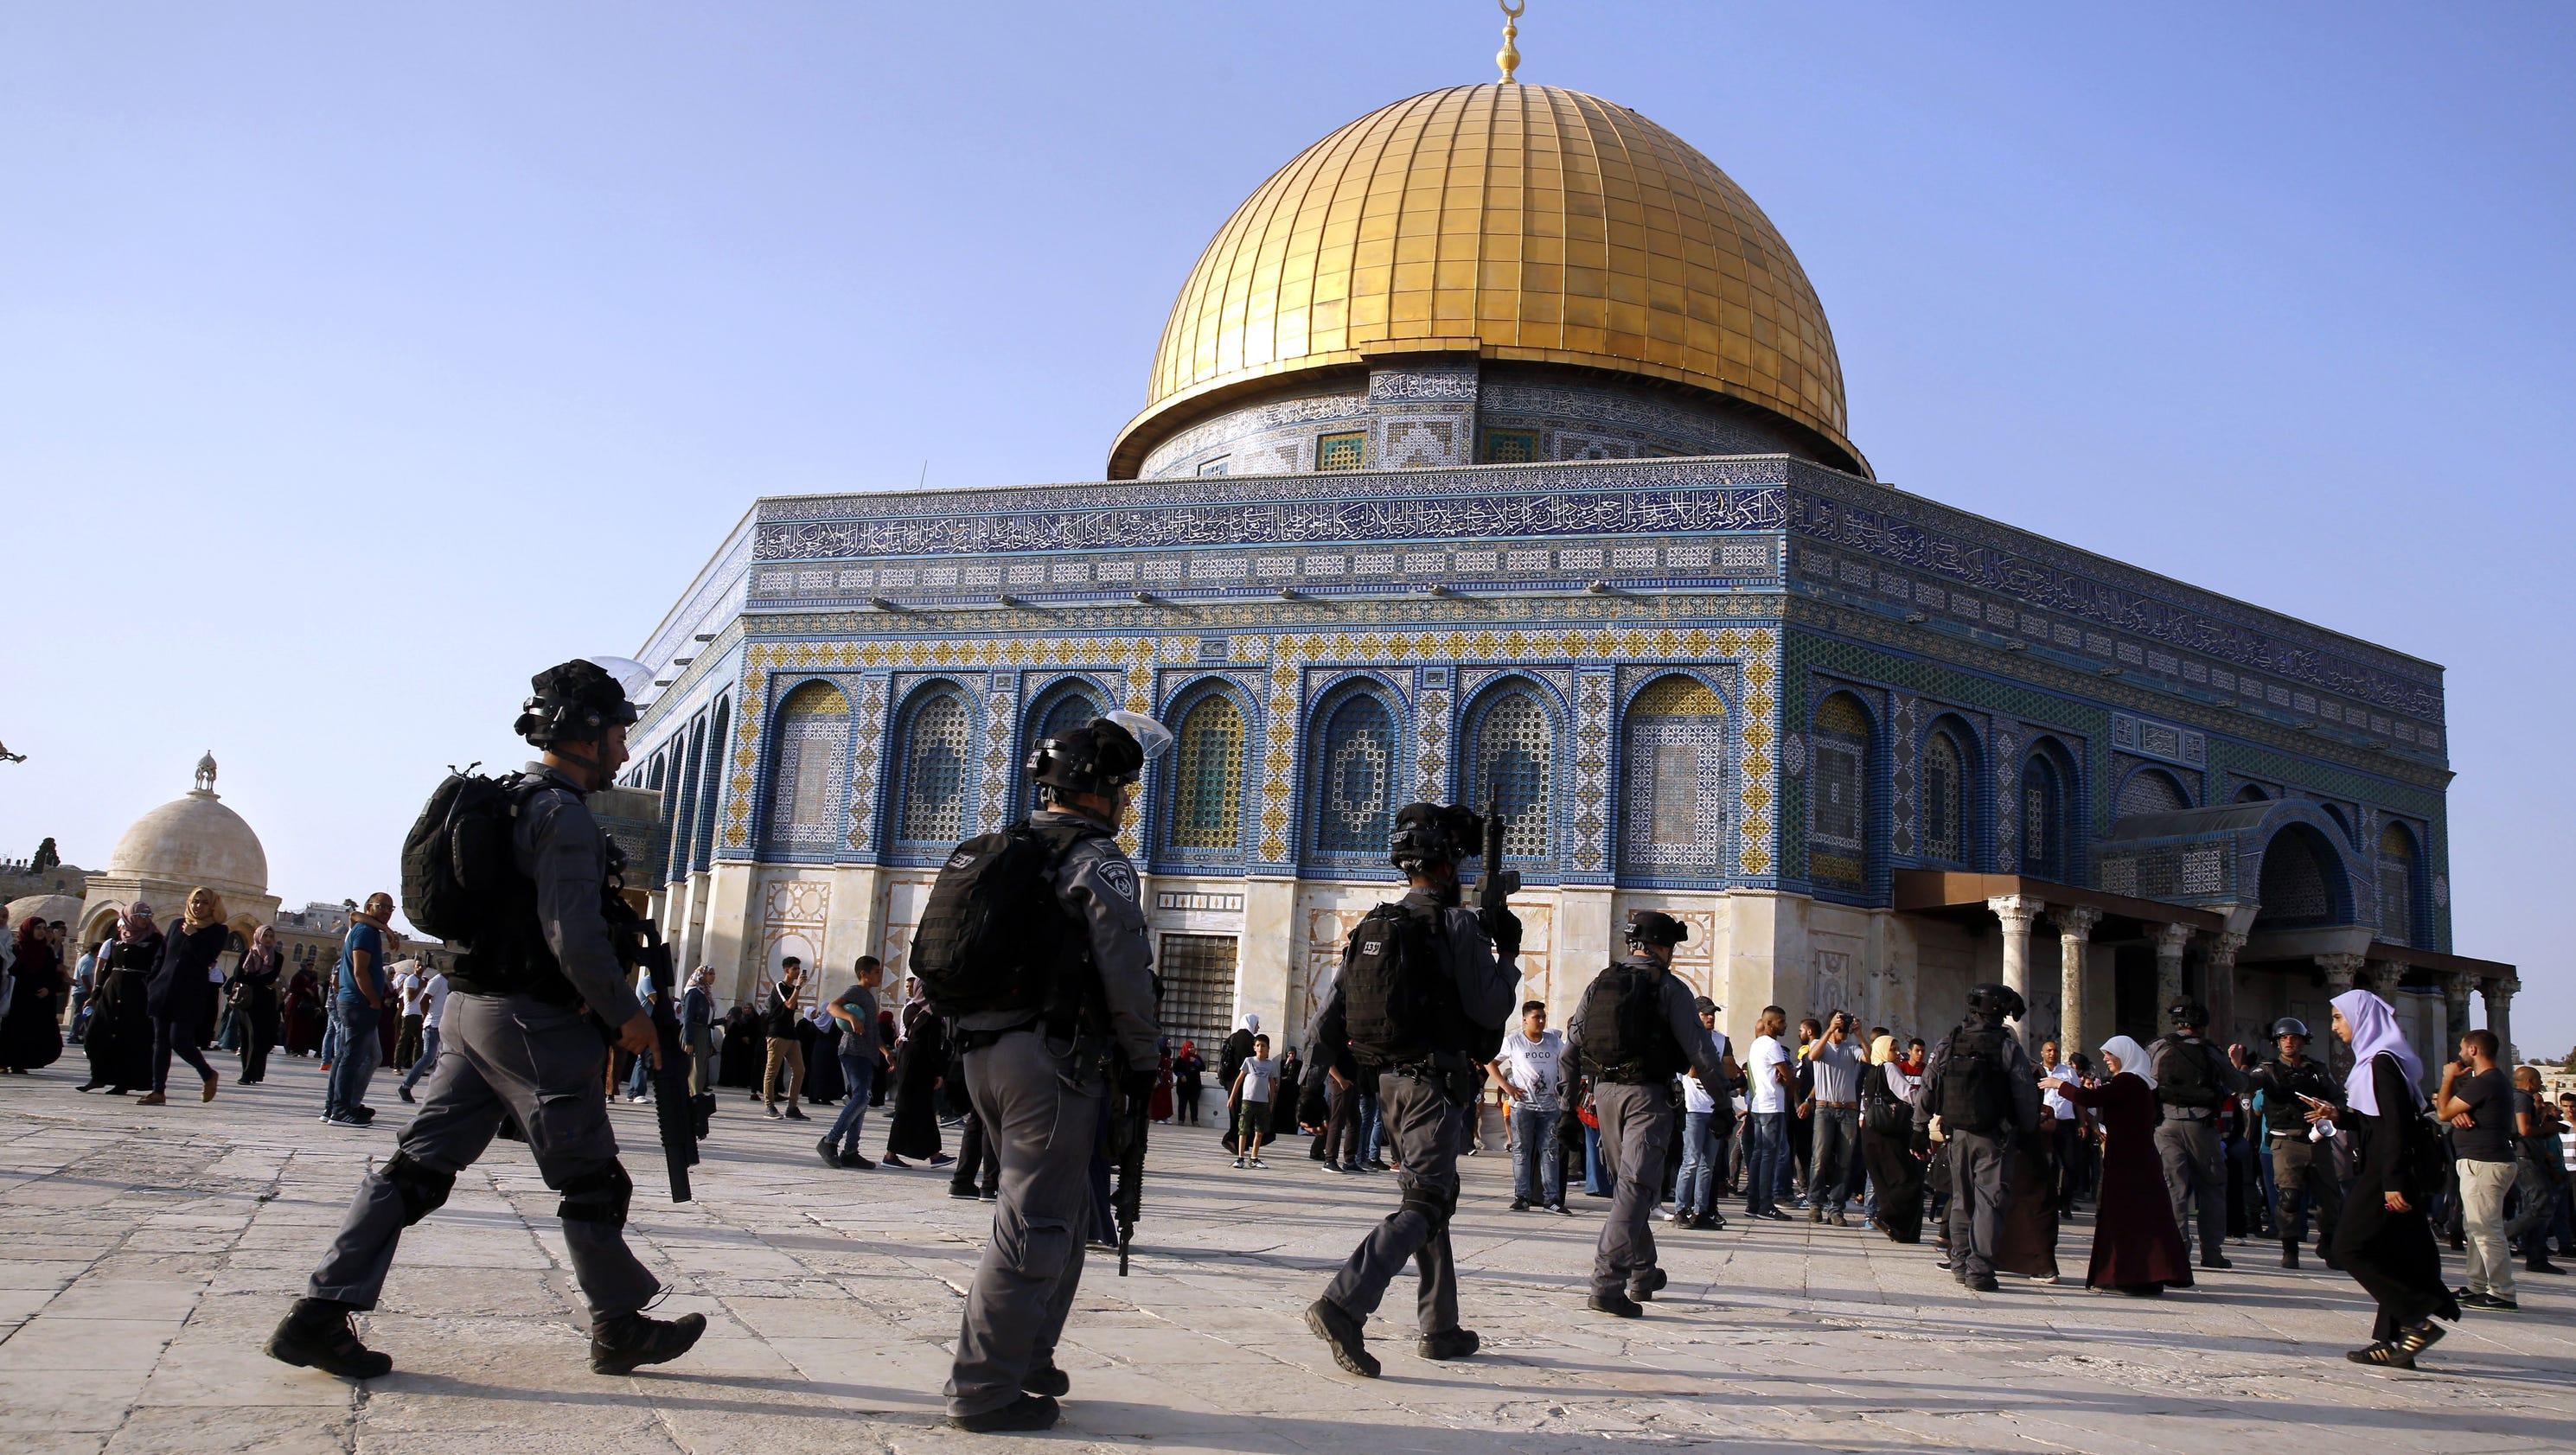 Muslim men over 50 banned from Jerusalem shrine as police on high alert